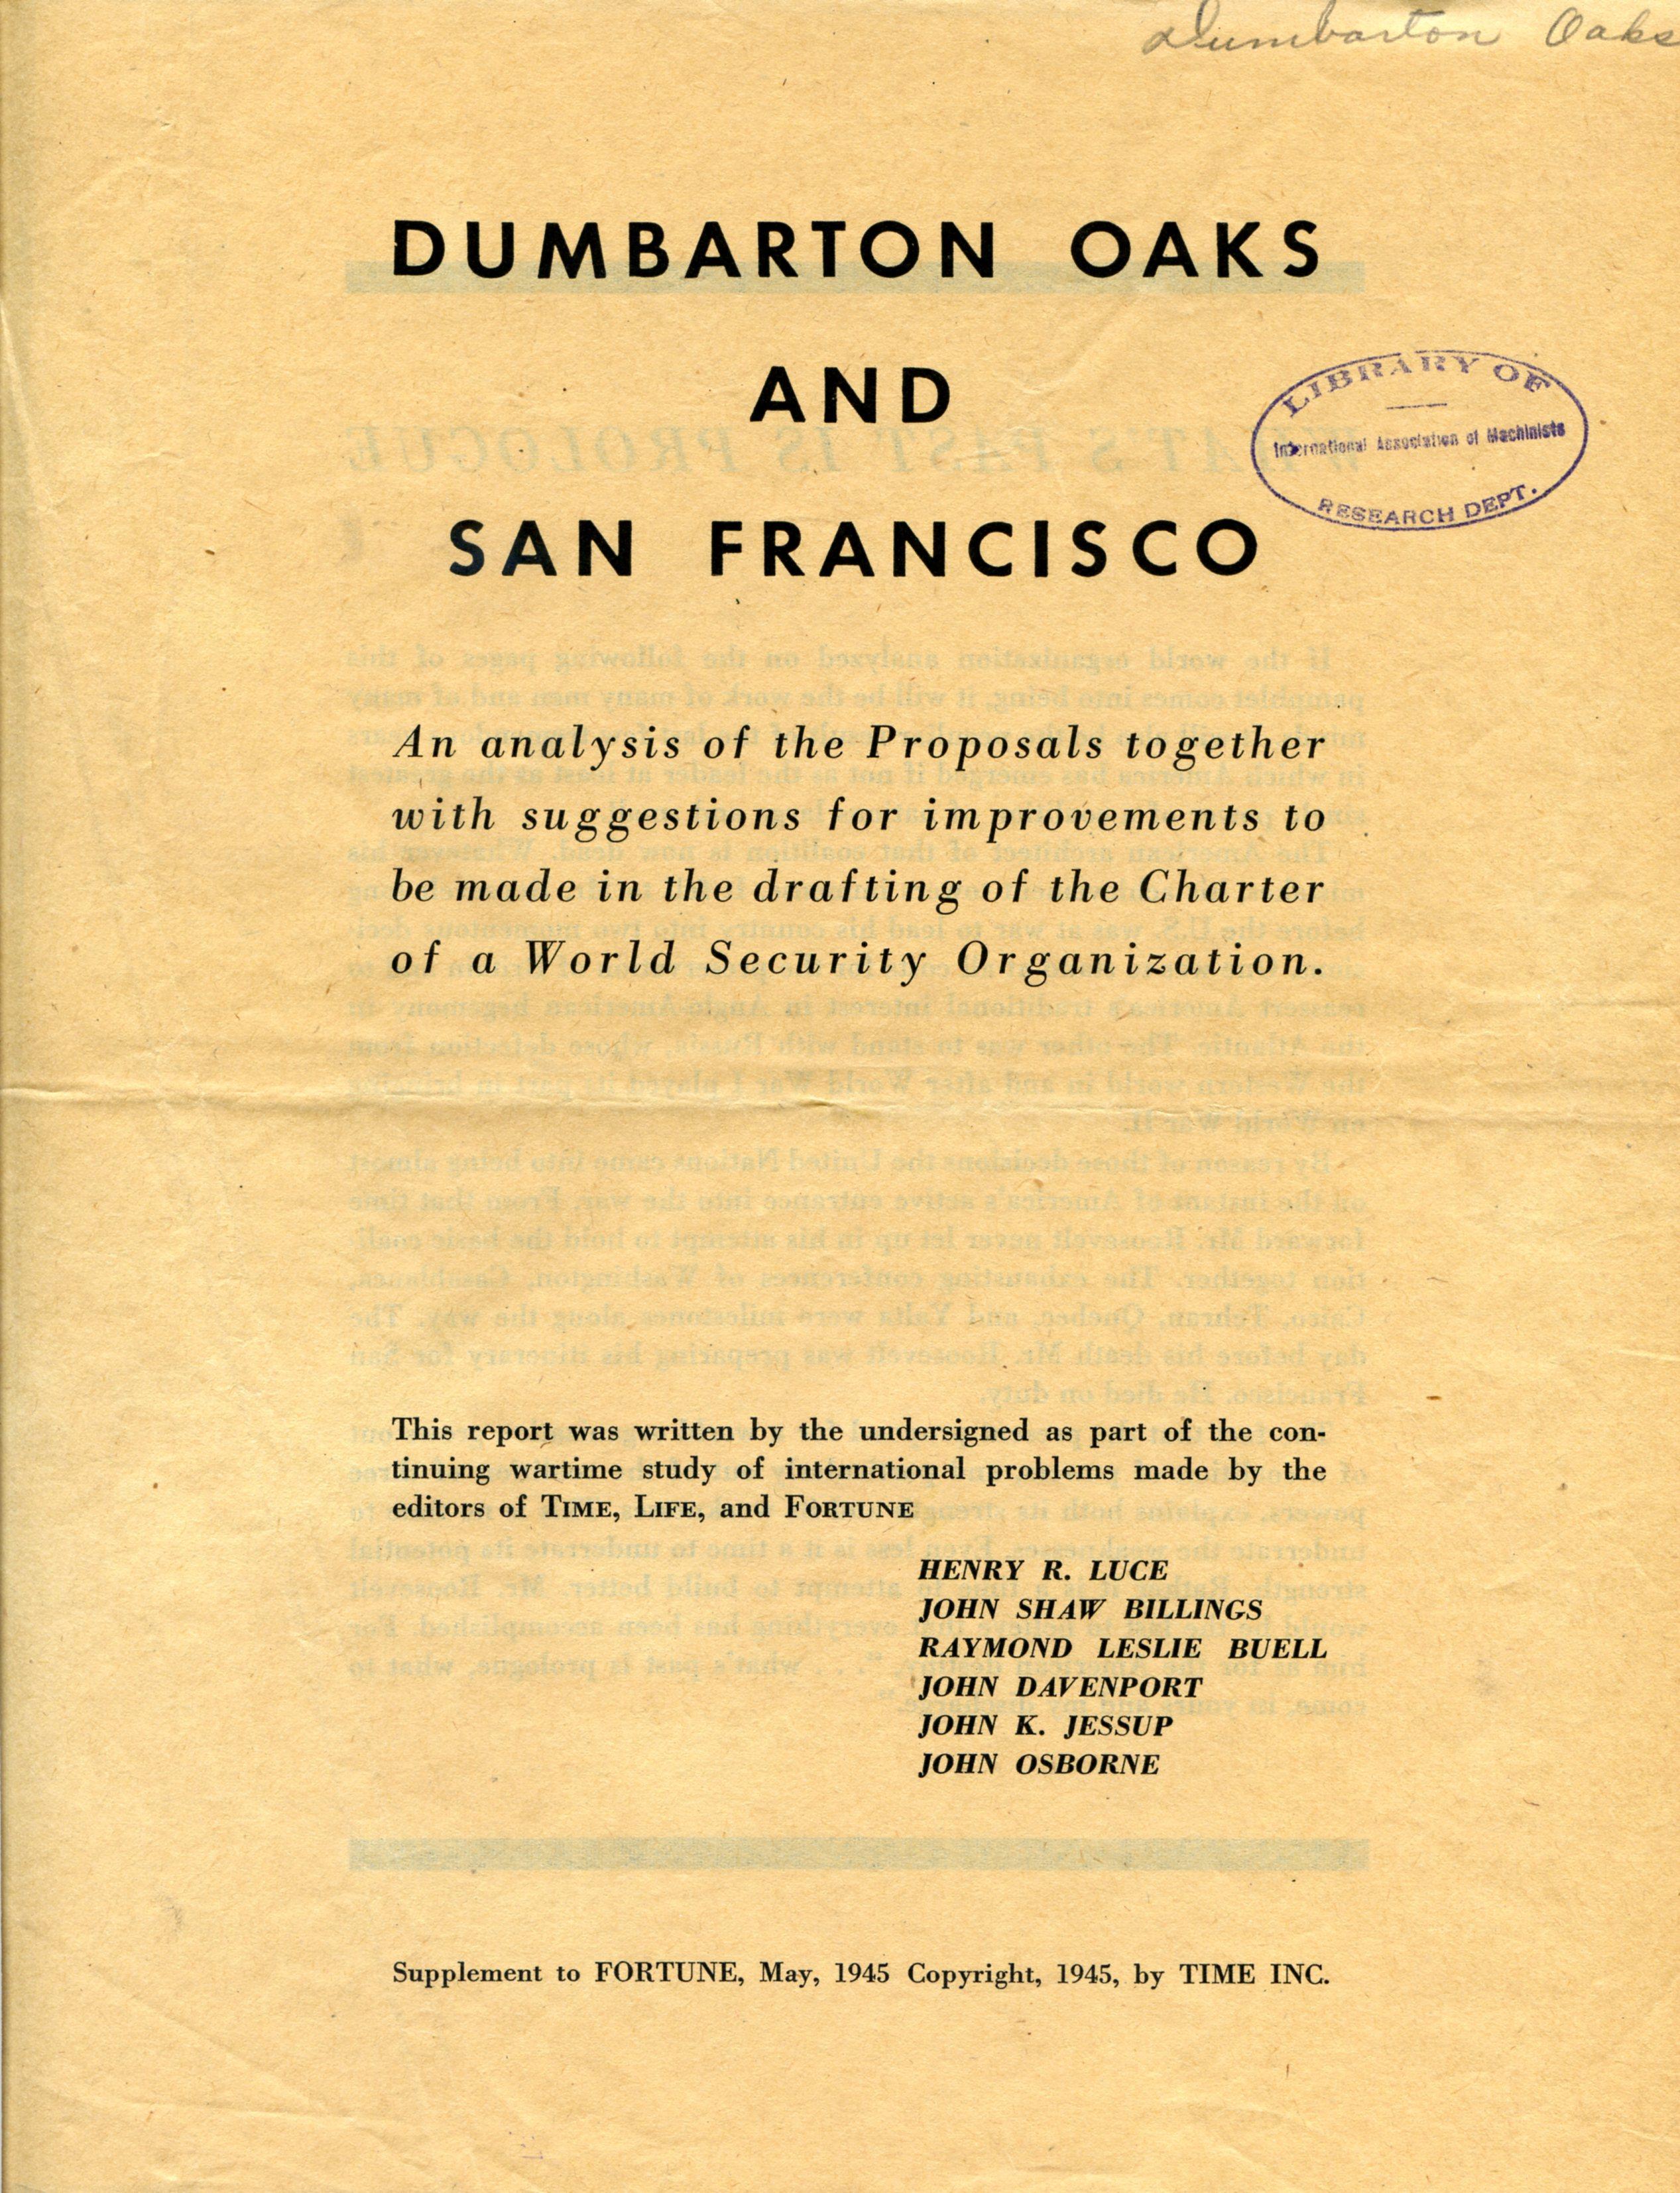 Dumbarton Oaks and San Francisco, An Analysis of the Proposals